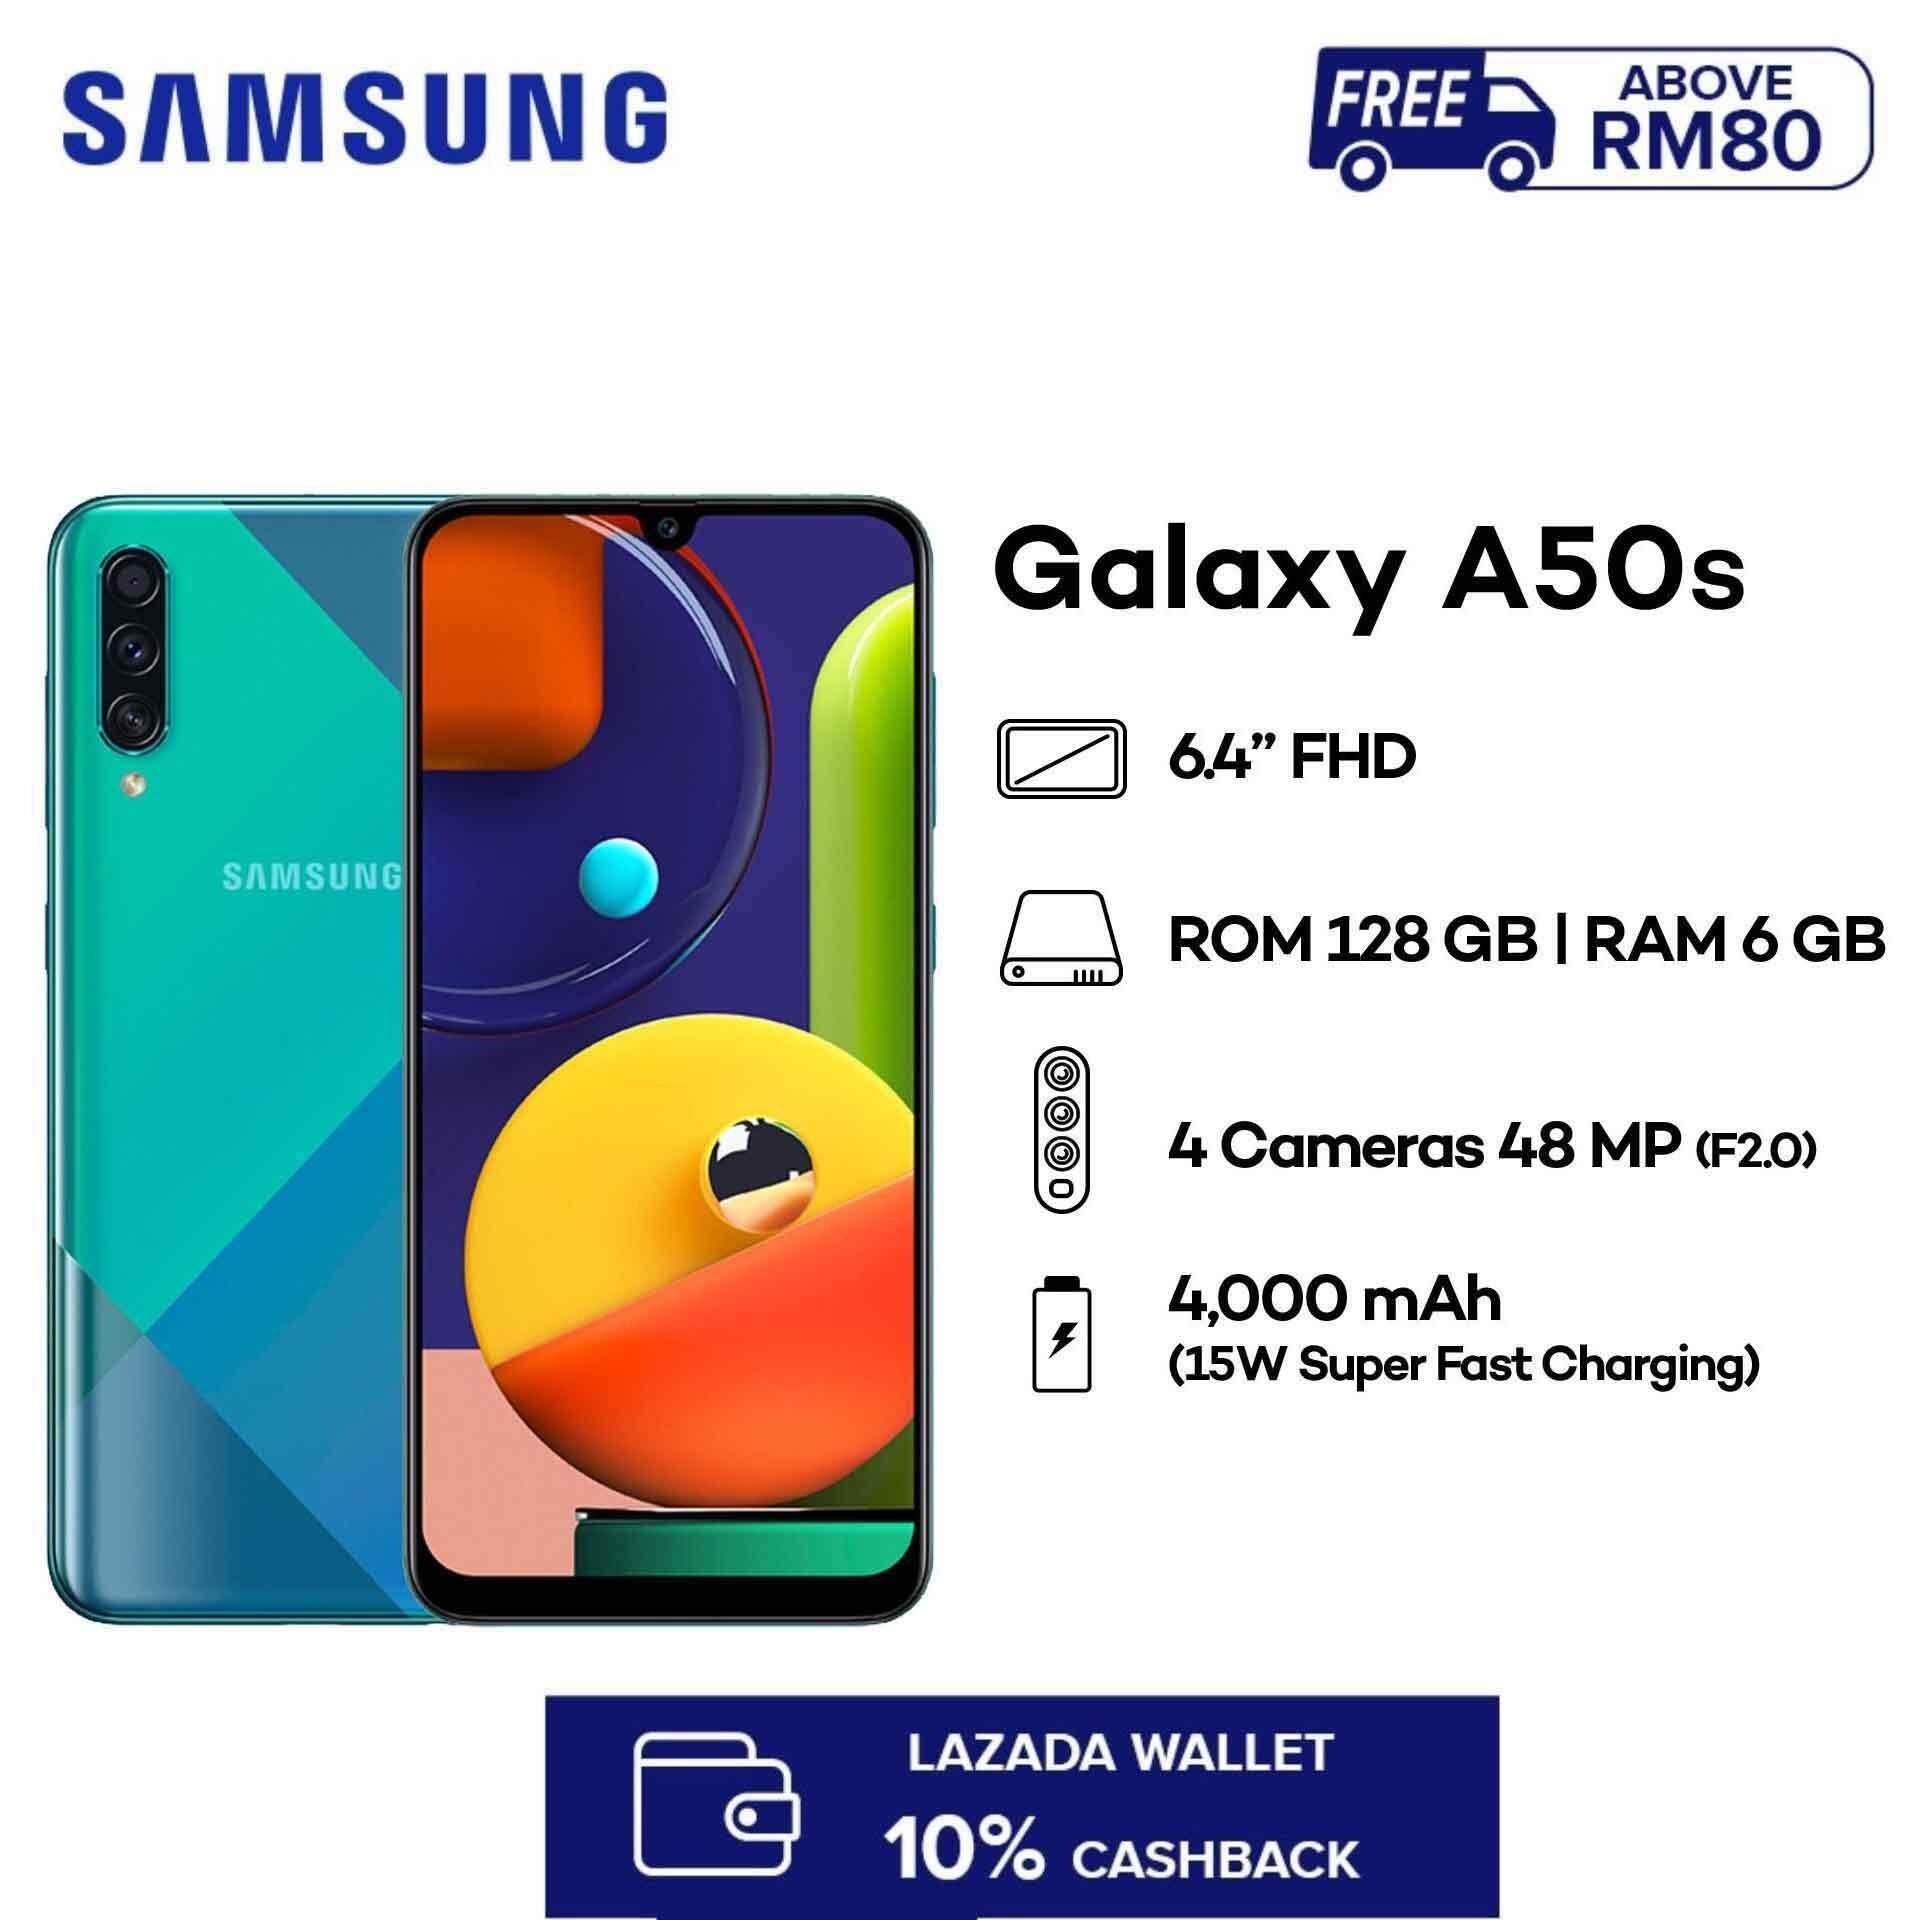 [12.12 Crazy Deals] Samsung Galaxy A50s (6GB RAM + 128GB ROM) Smartphone with 1 Year Samsung Warranty , Free Shipping